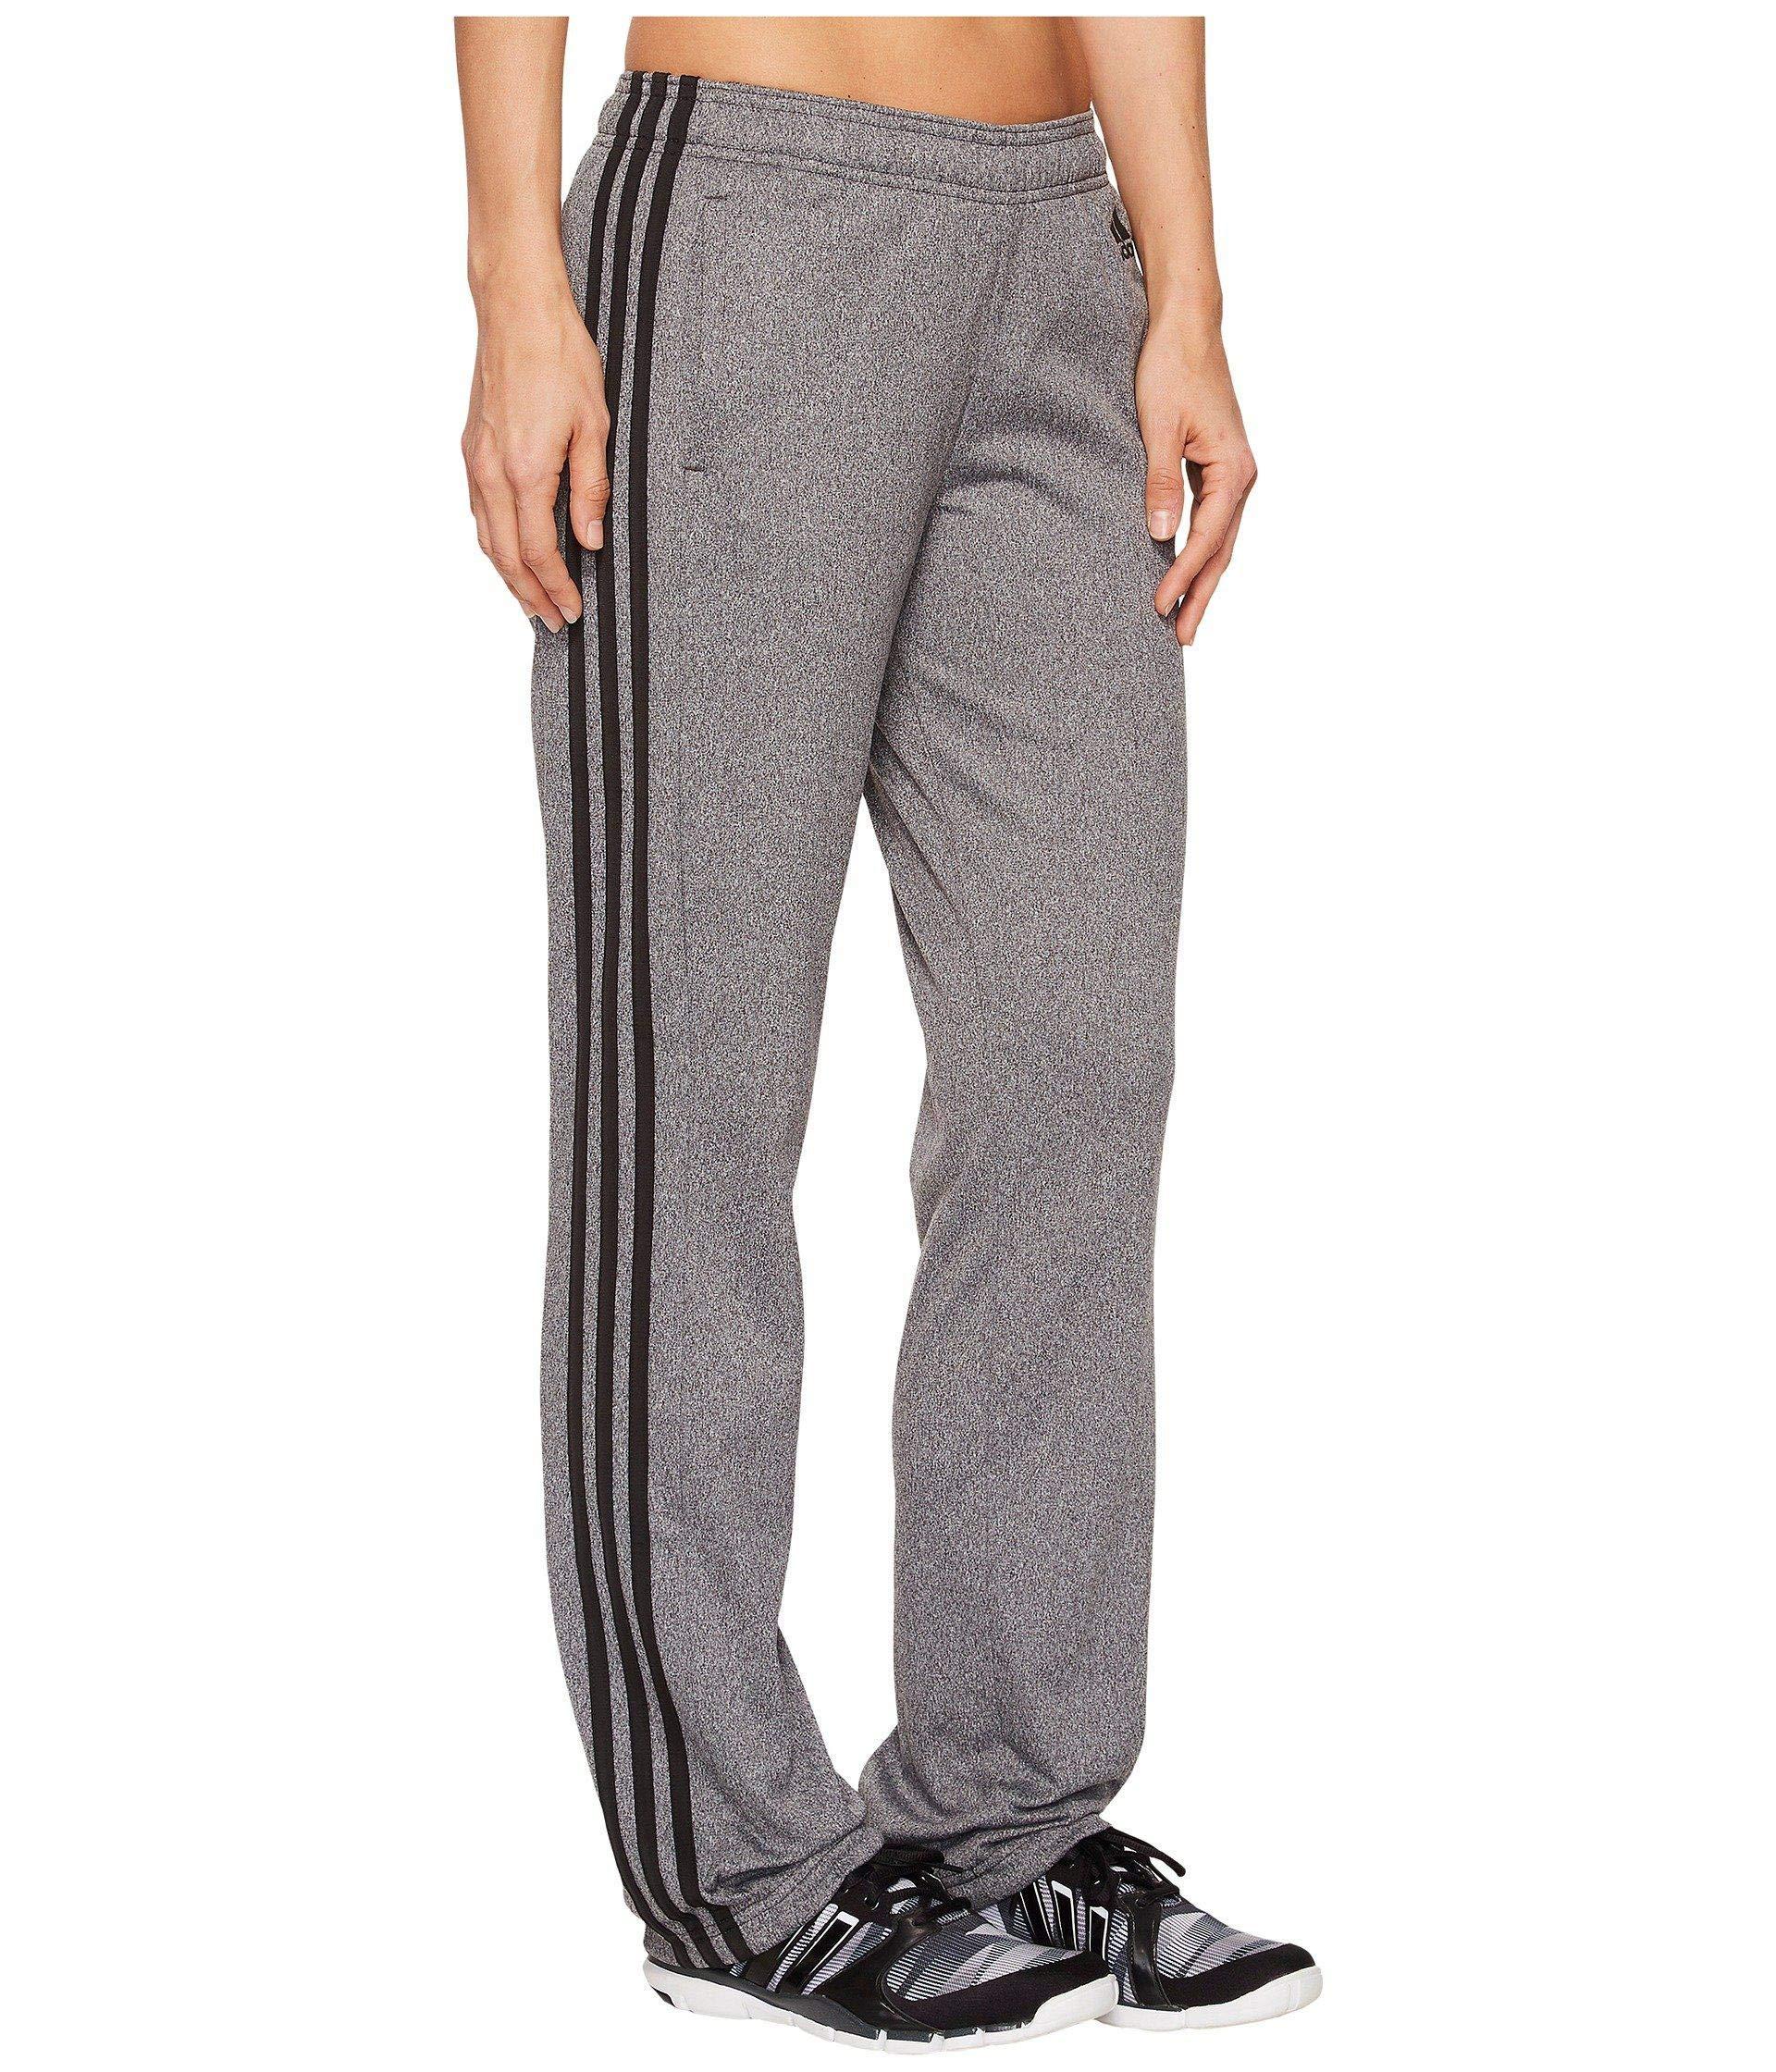 adidas Women's Designed-2-Move Straight Pants Dark Grey Heather/Black X-Small 29 29